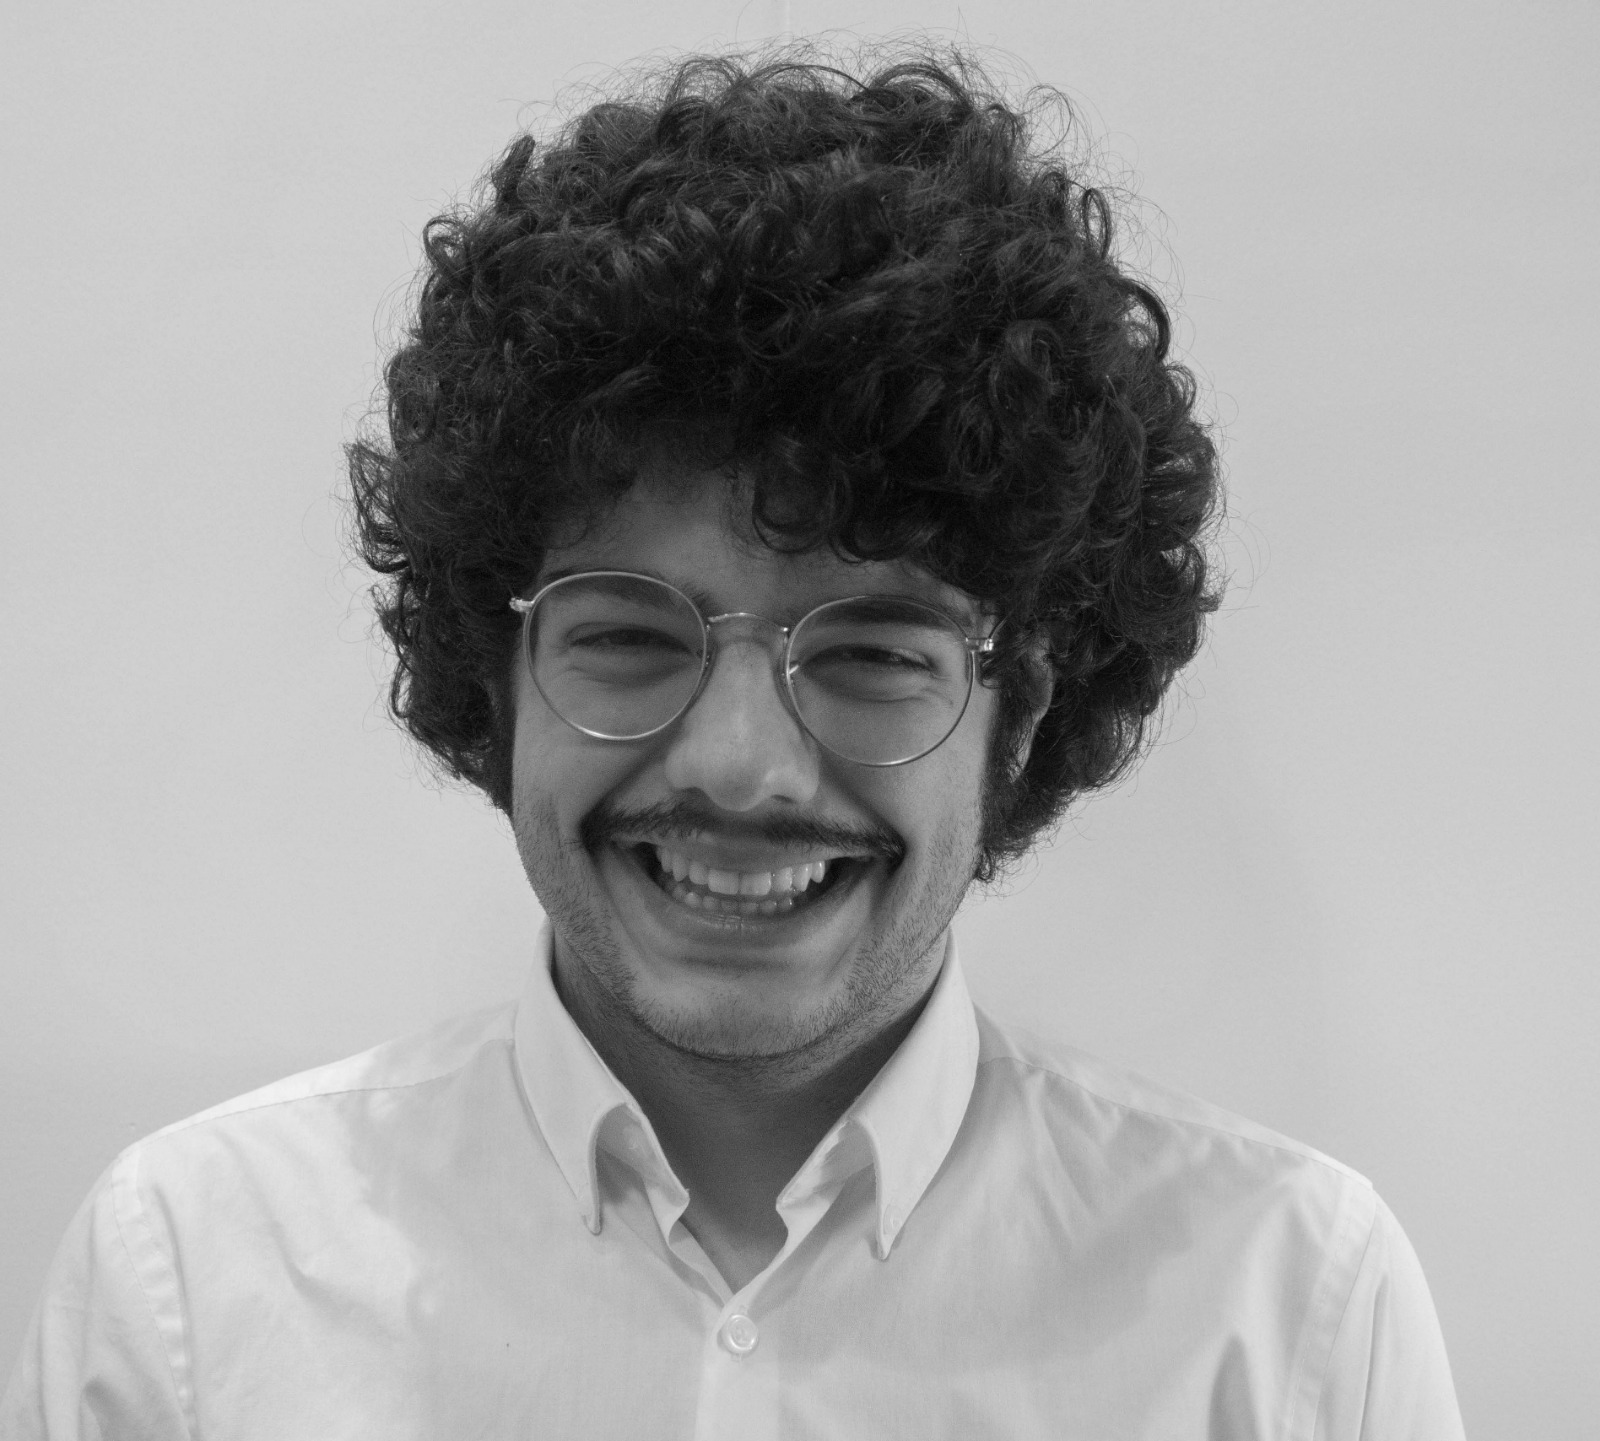 Diego Florez